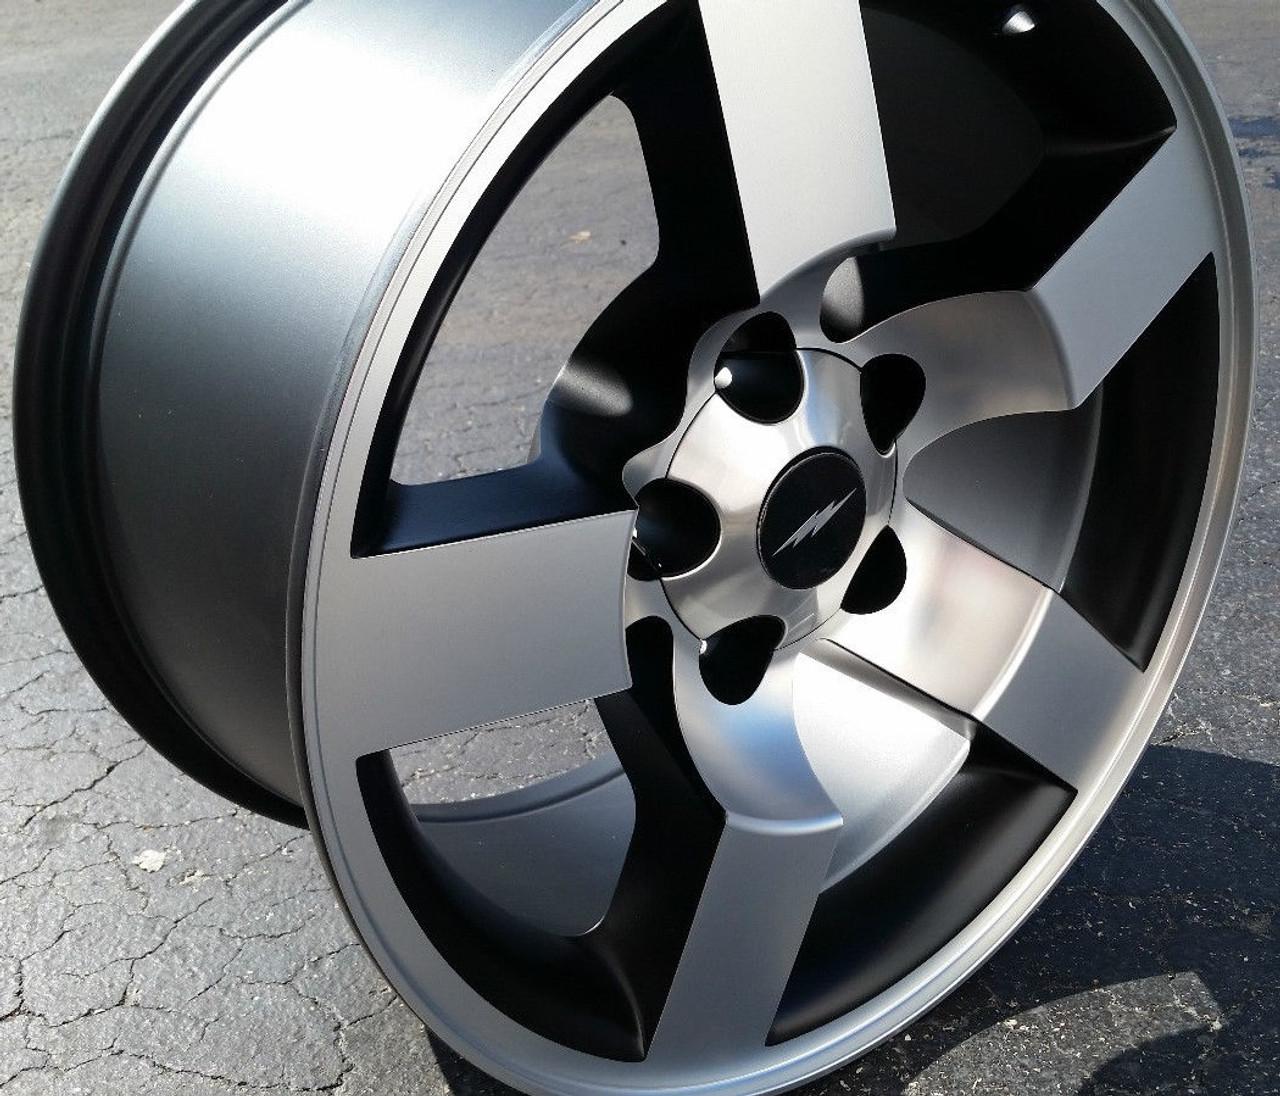 18 Ford Lightning Wheels F150 Svt Style Rare Machined Black Set Of 4 18x9